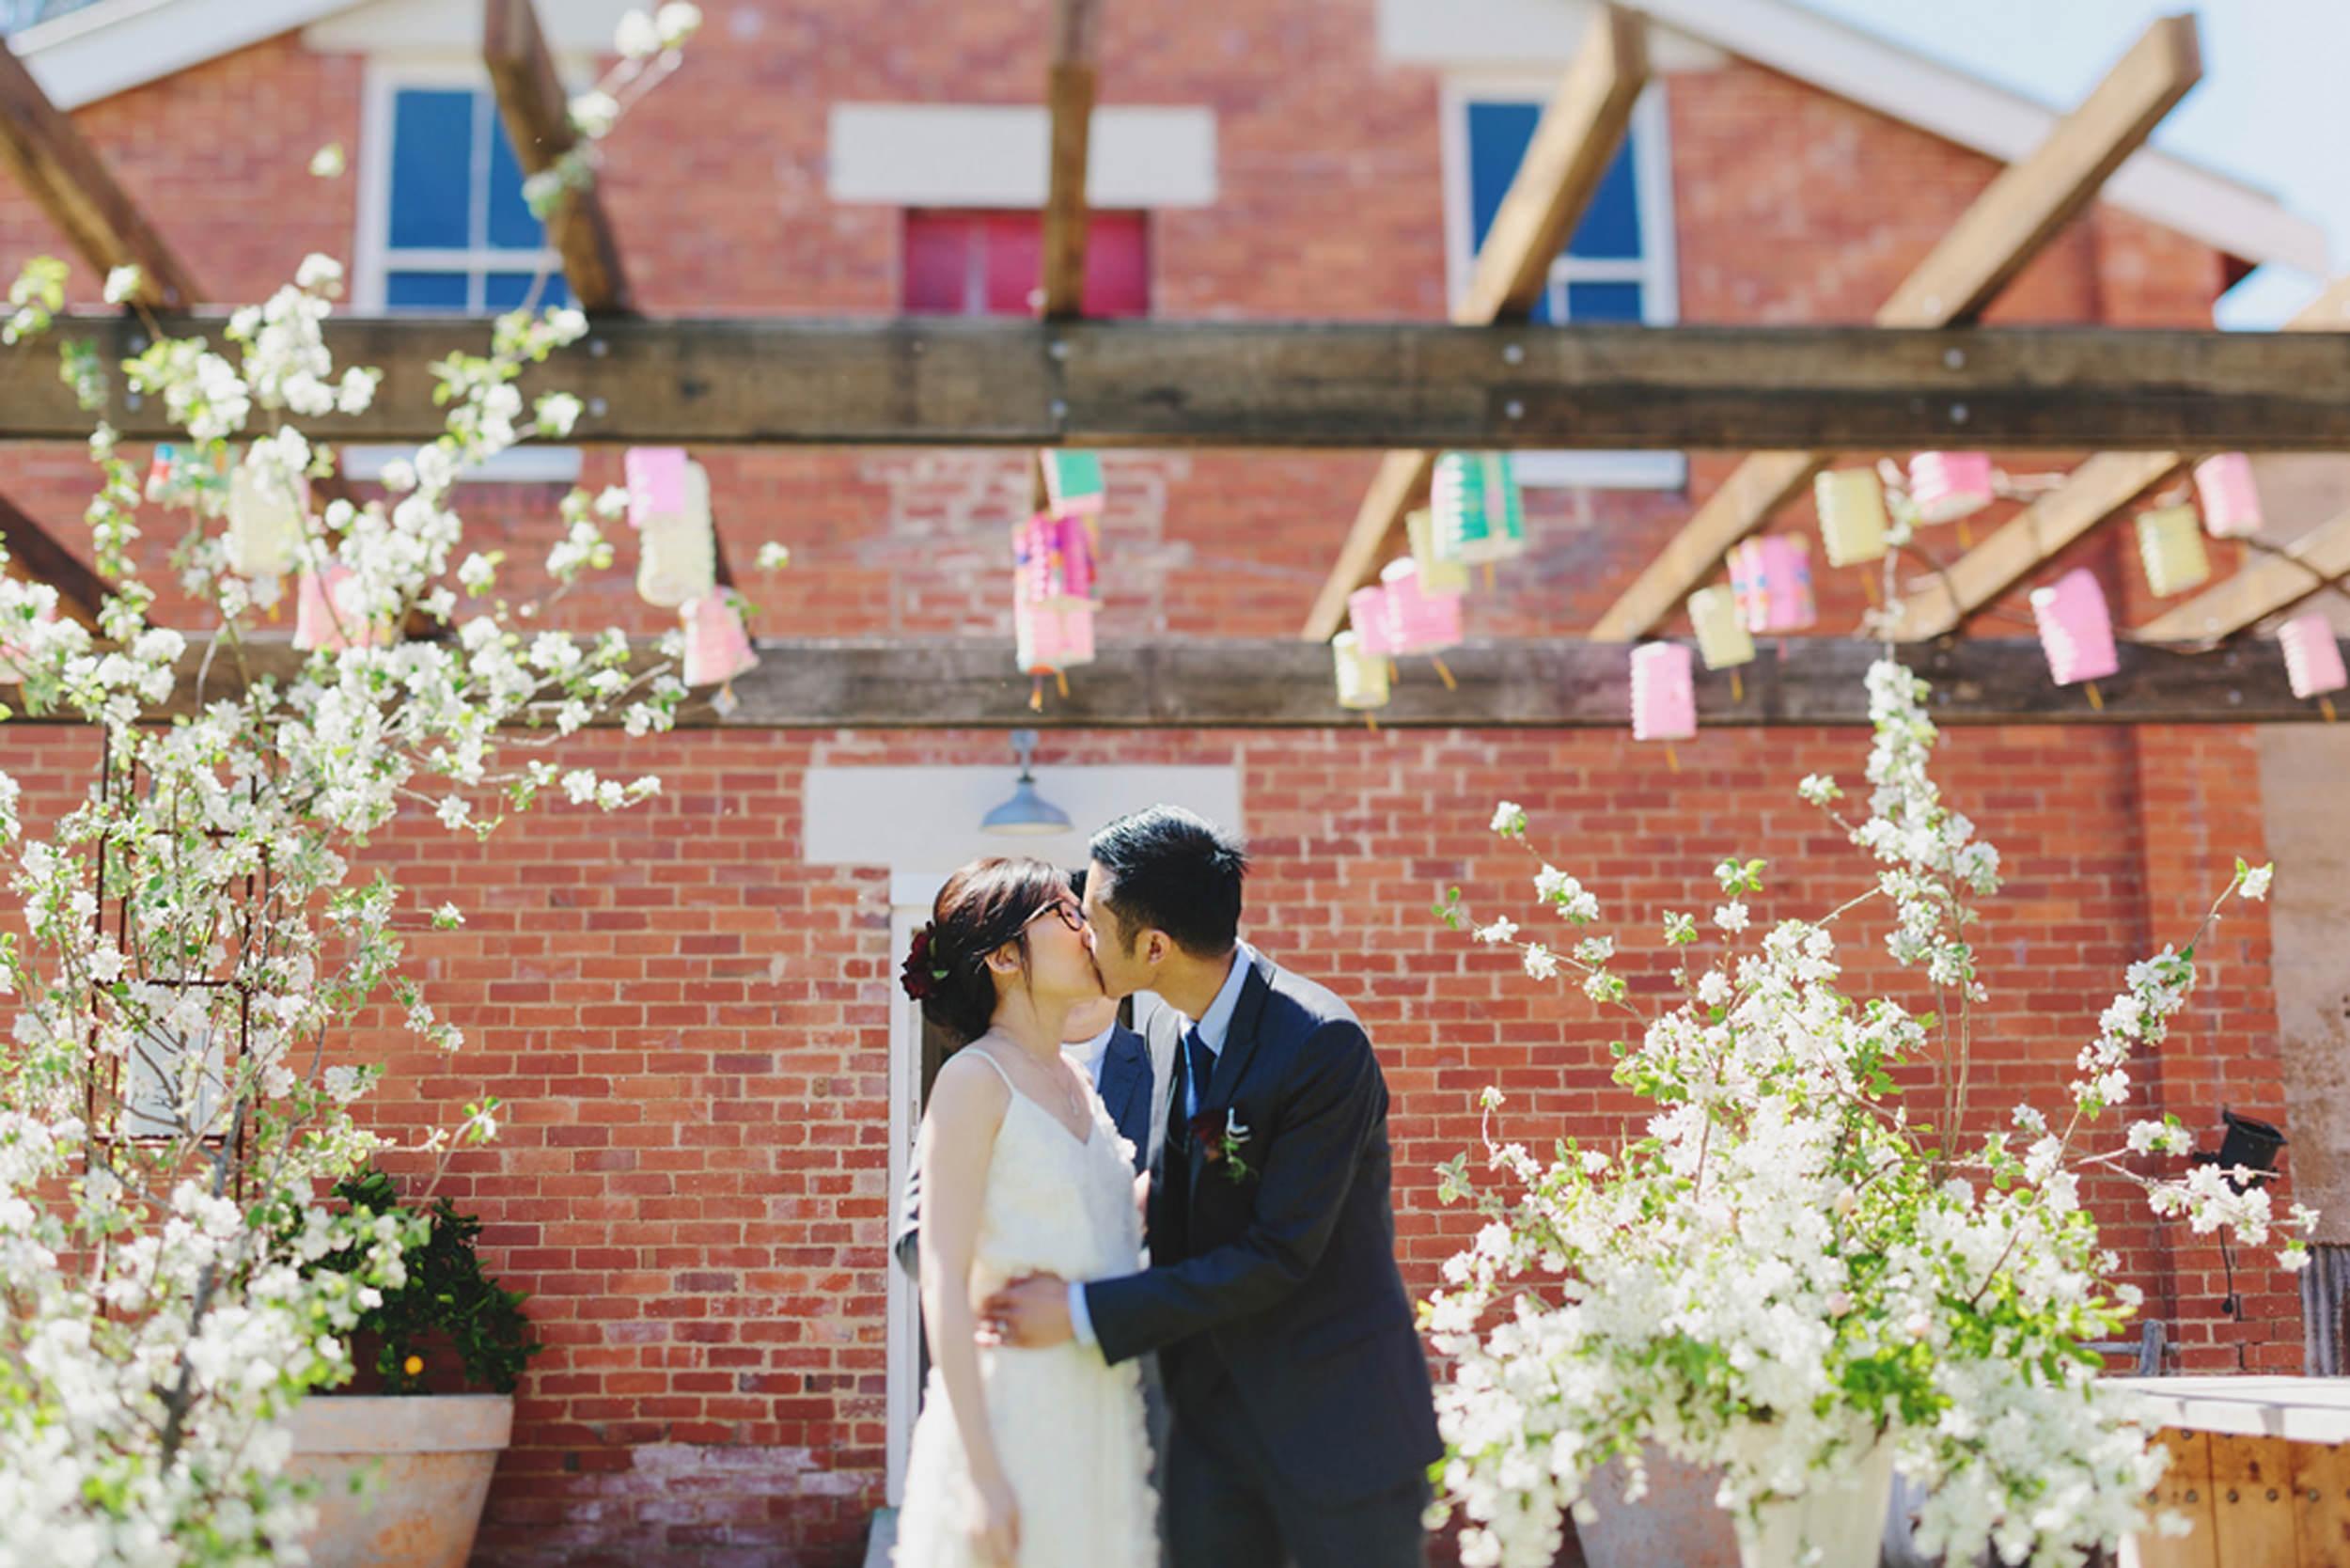 Butterland_Wedding_Anthony_Rachel33.JPG